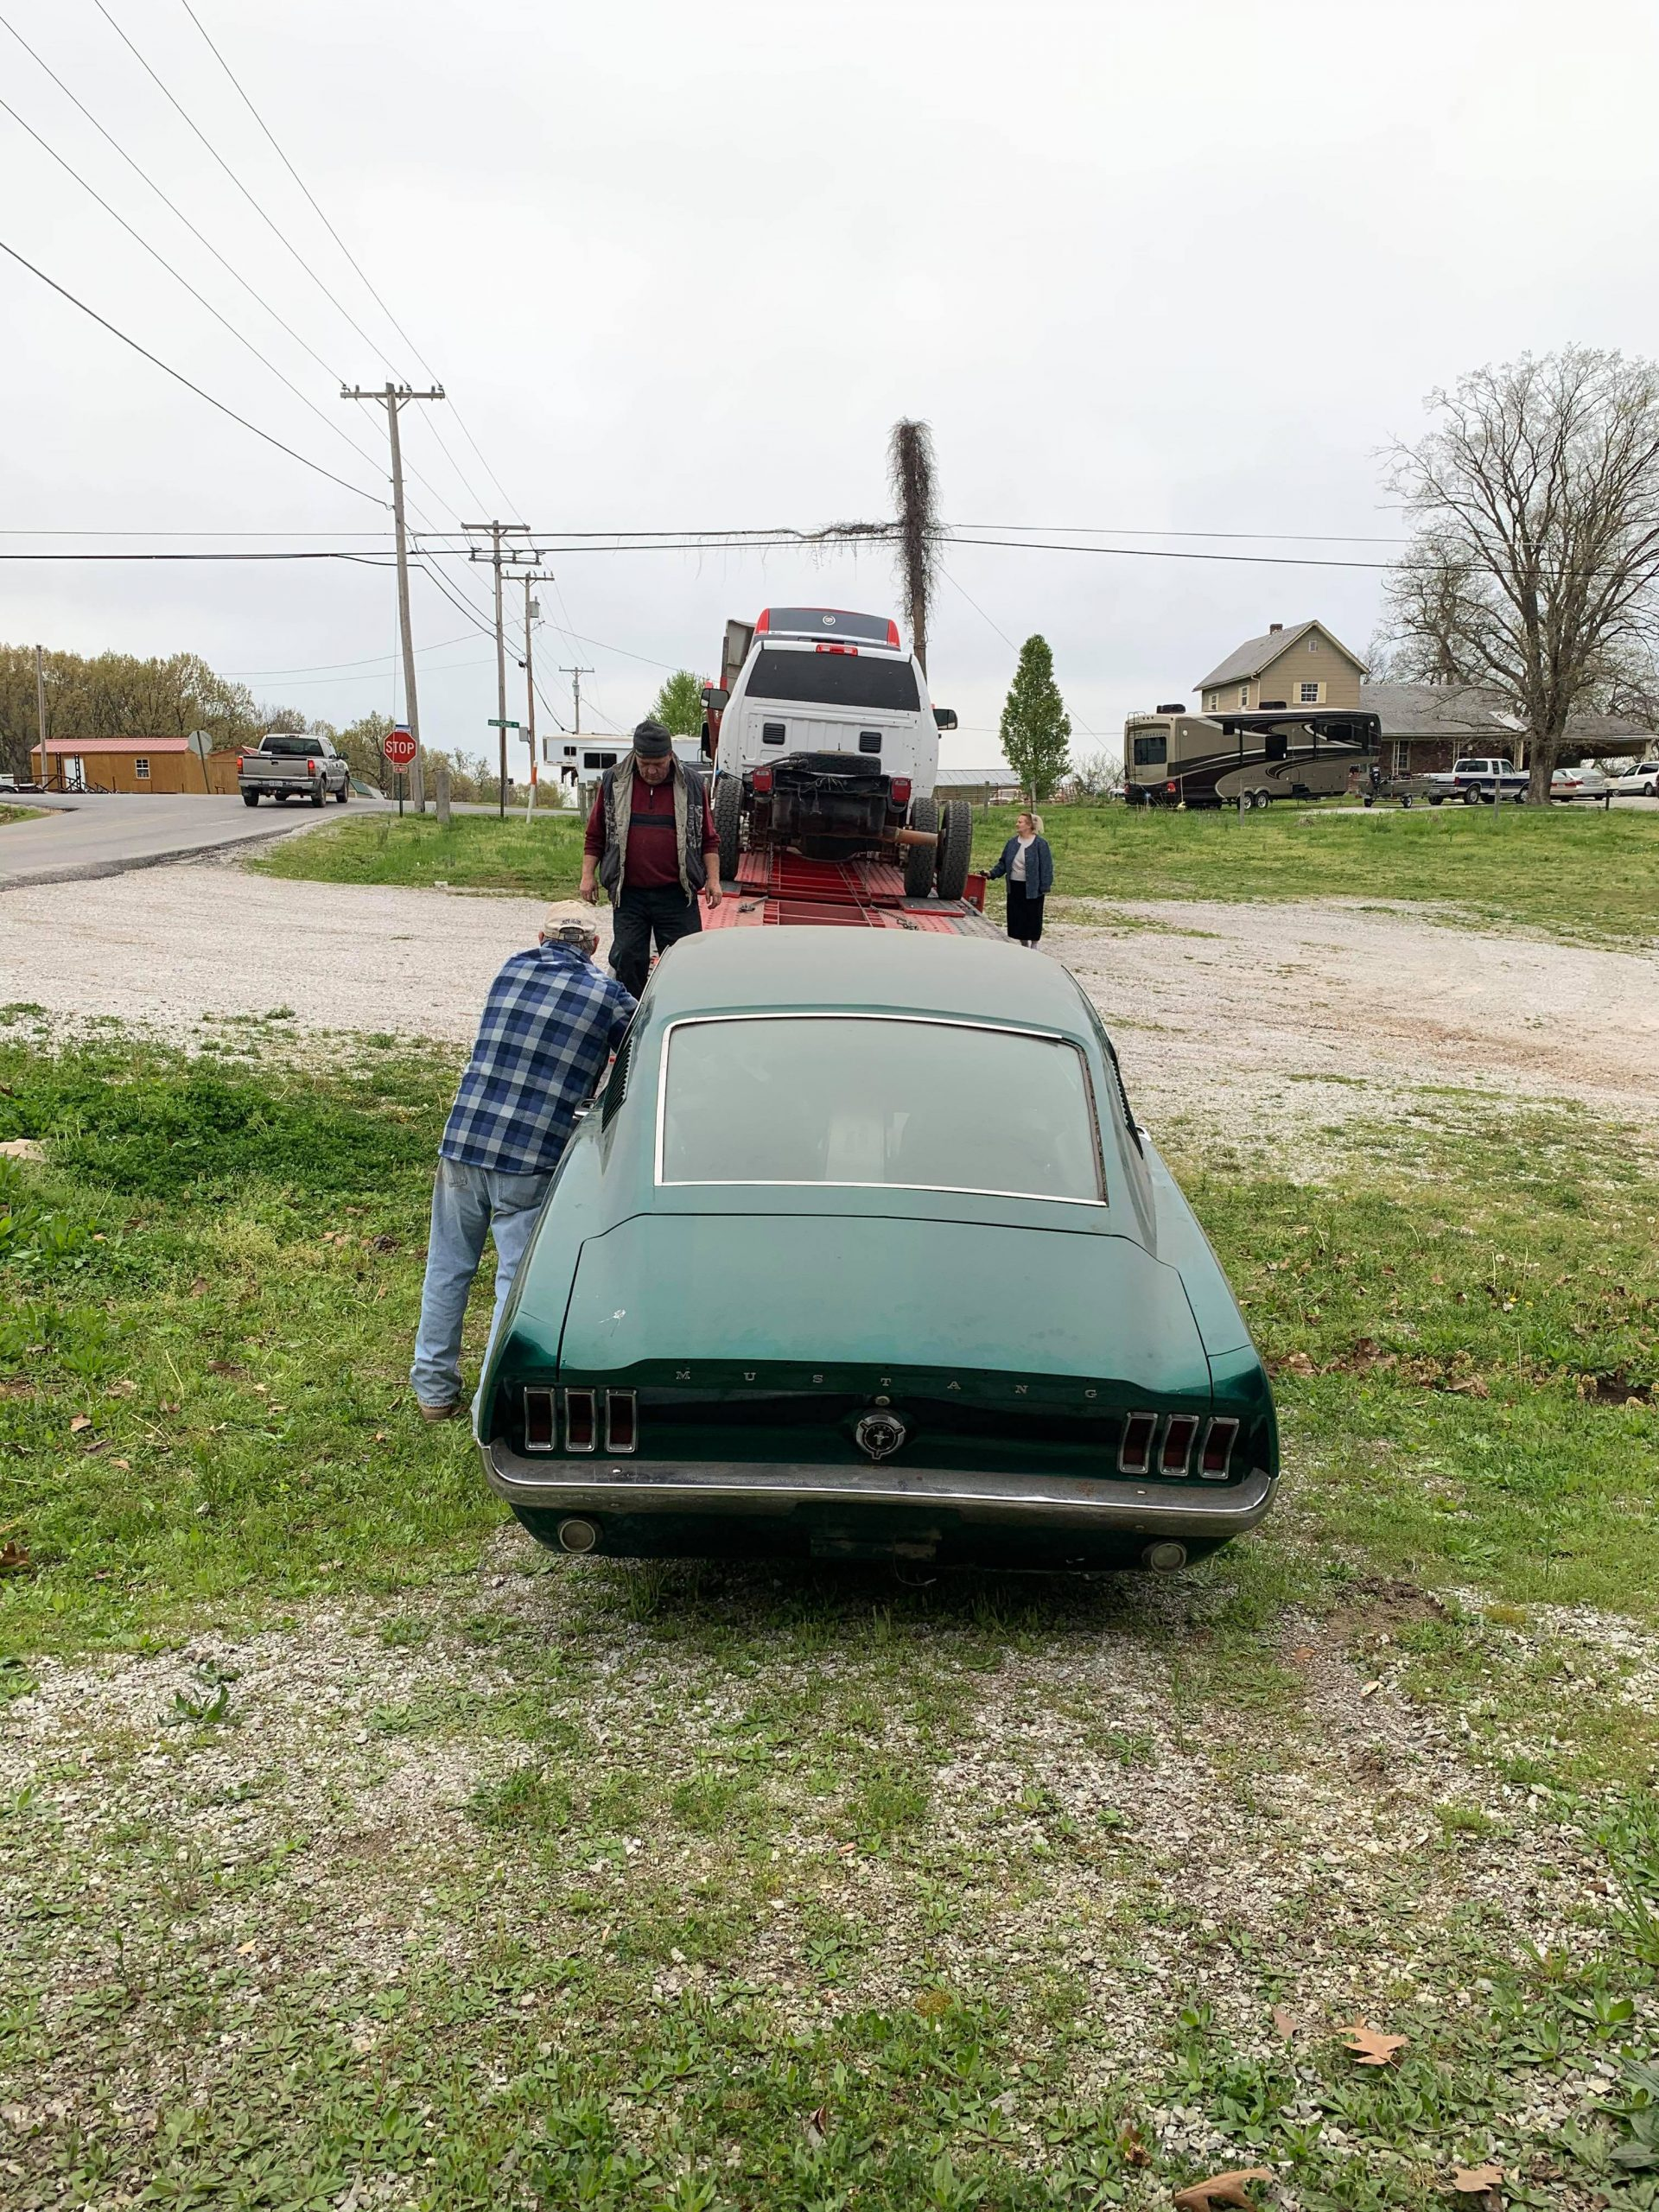 1967 mustang barn find